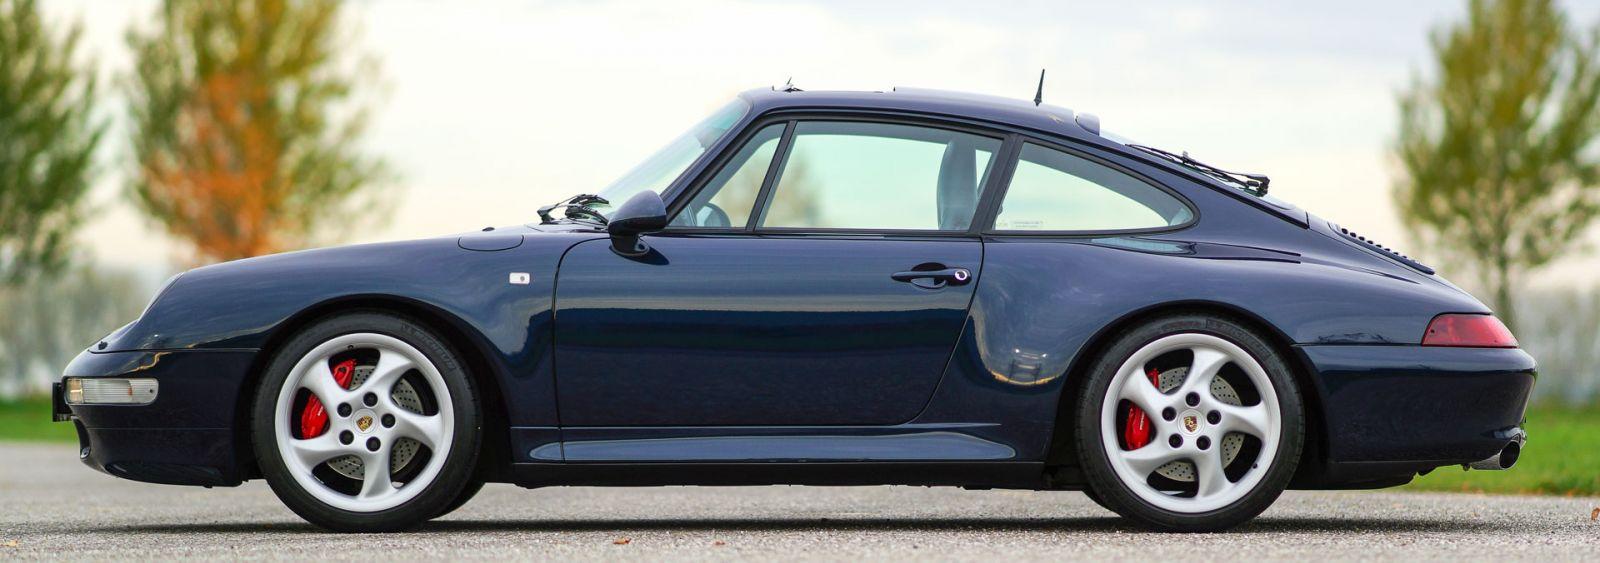 Porsche 911 (993) Carrera 4S, 1997